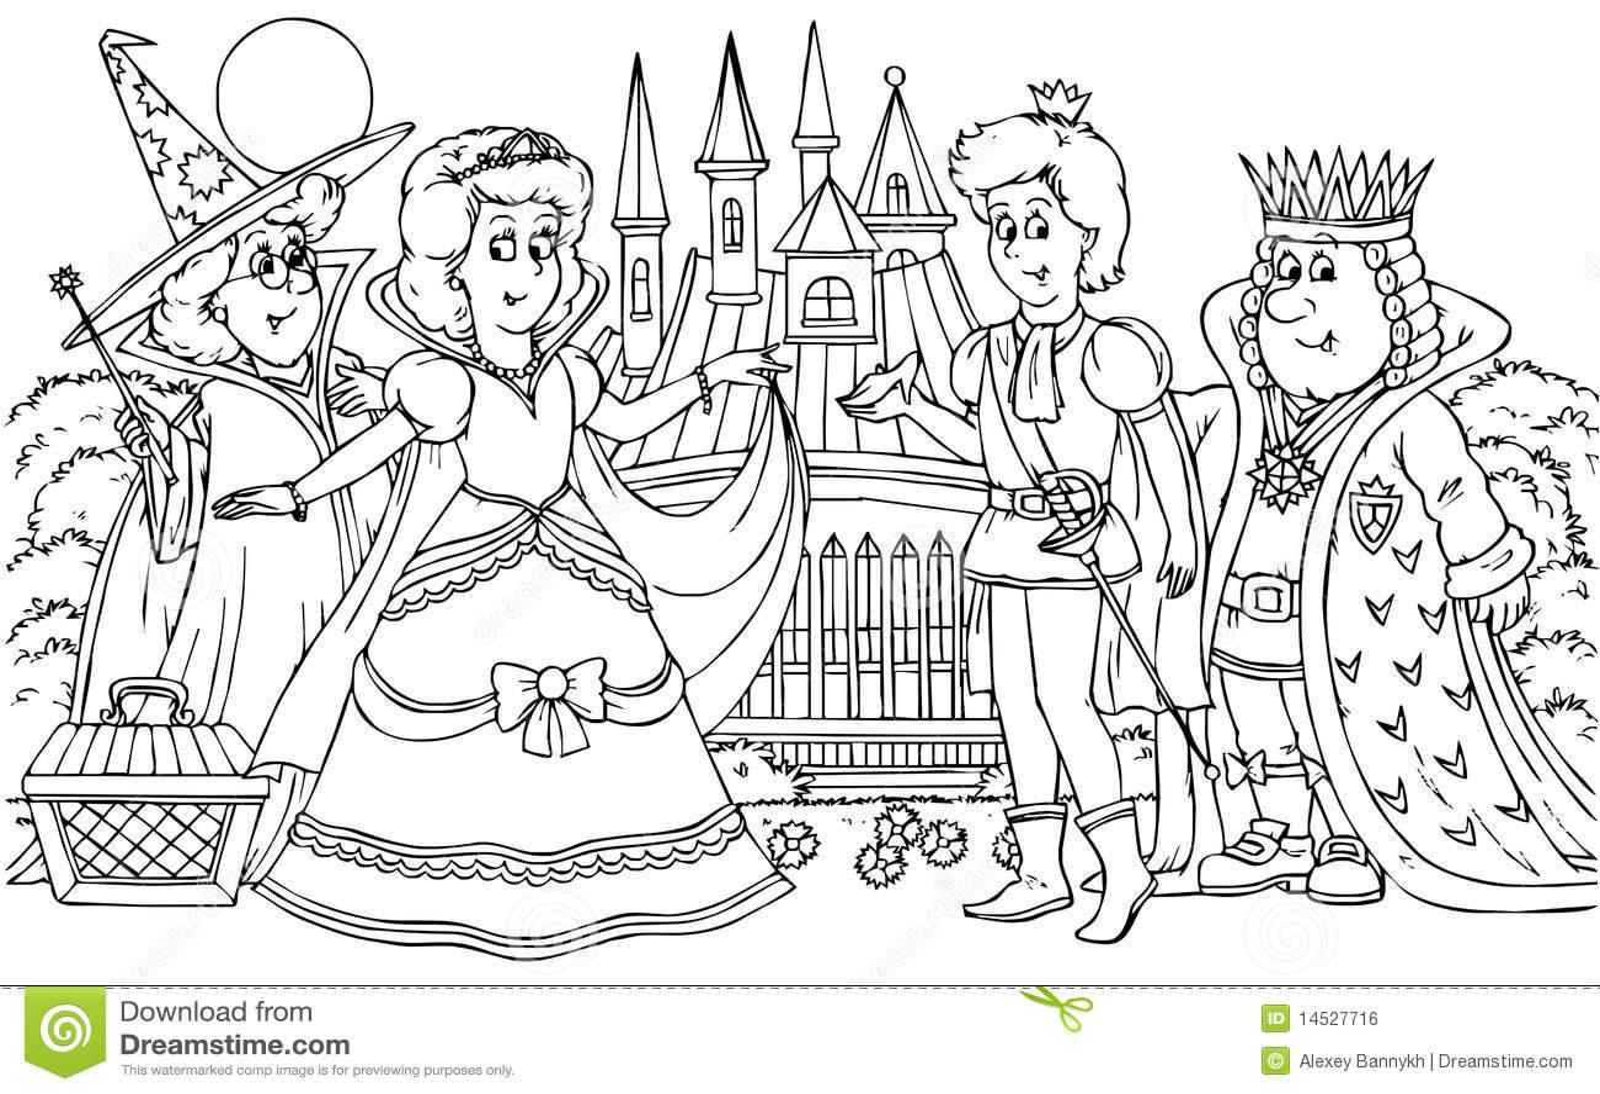 Kleurplaten Prinses Leonora Prince And Princess Stock Illustration Illustration Of